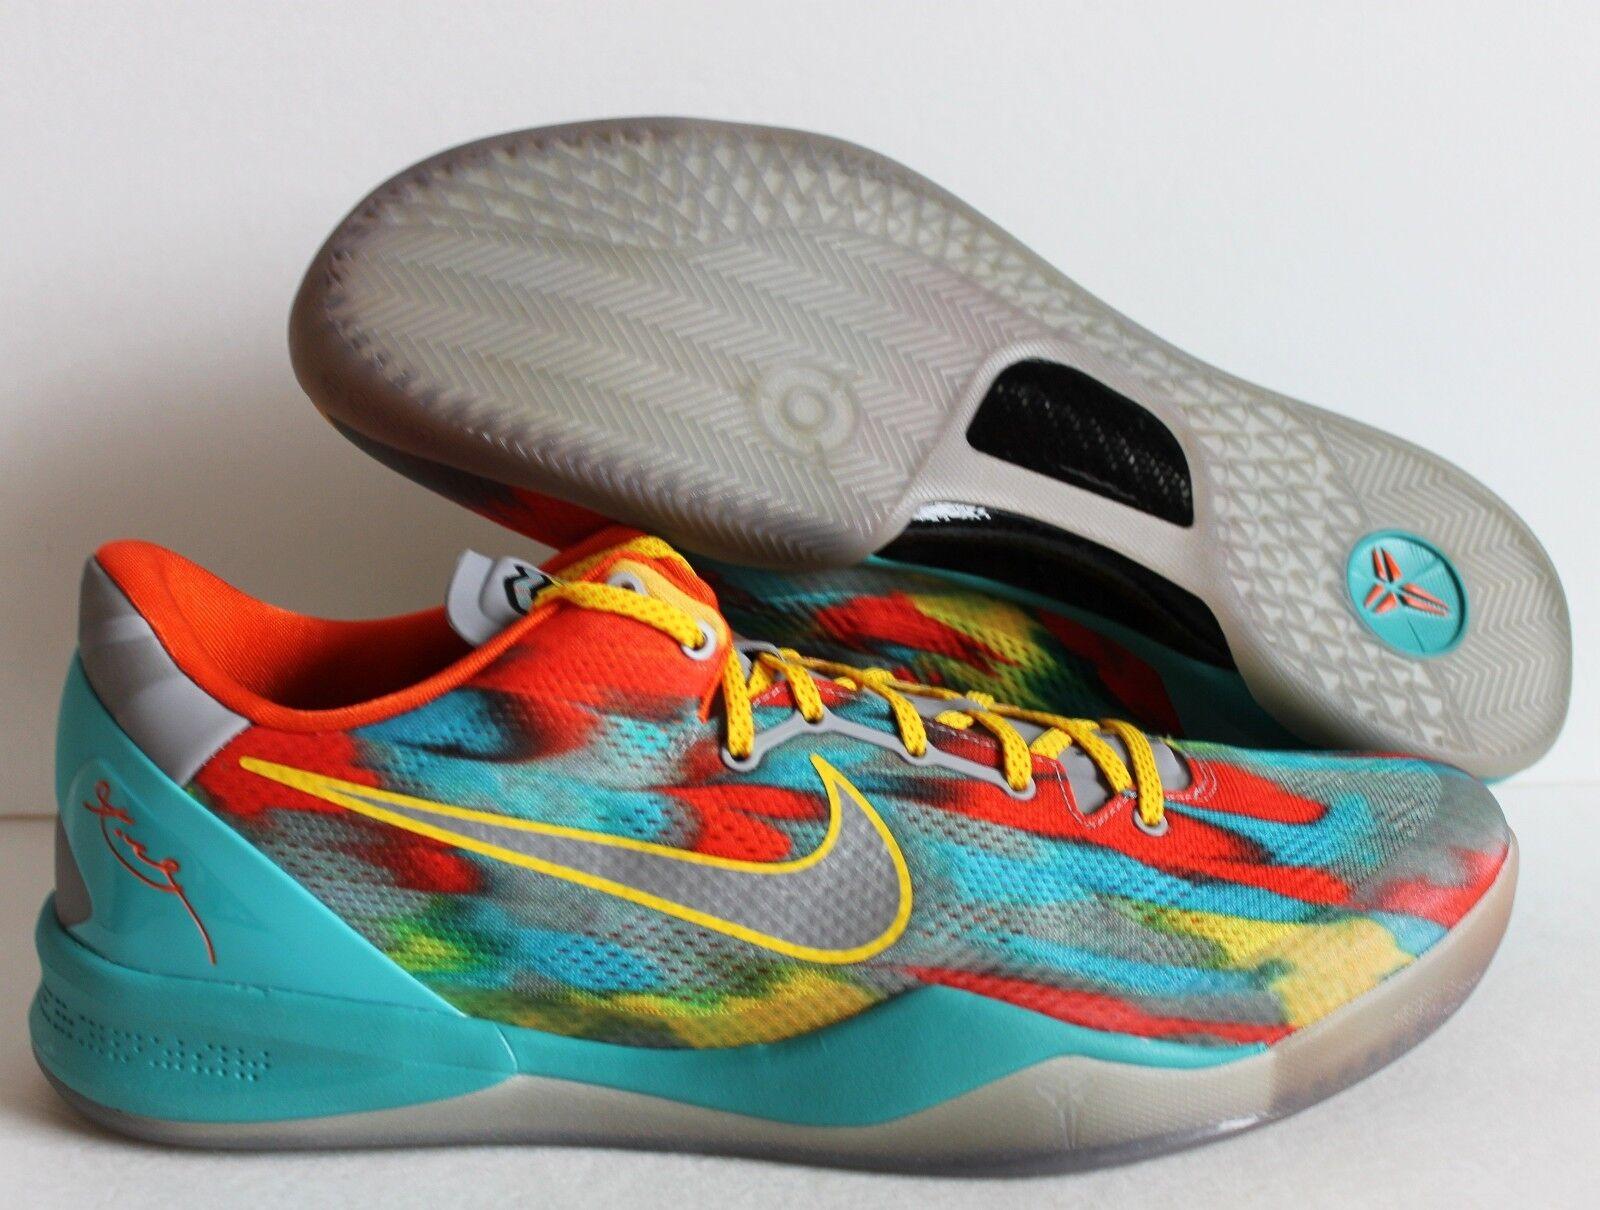 Nike Kobe Stadium 8 System Venice Beach Stadium Kobe Gris / Plata reduccion de precio el modelo mas vendido de la marca b7dc7d